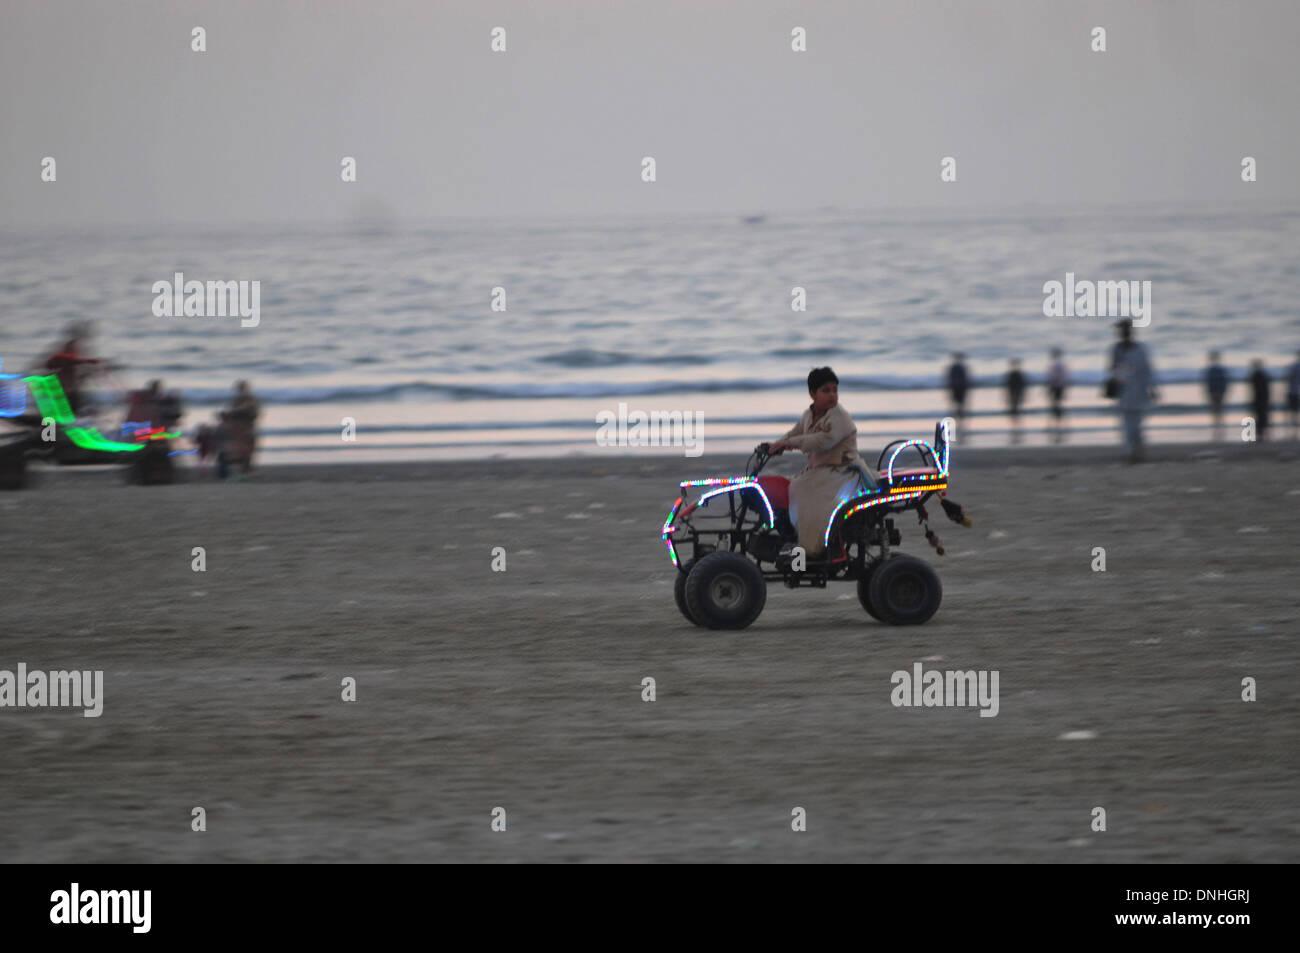 131230 131230) -- karachi, dec. 30, 2013 (xinhua) -- photo taken on